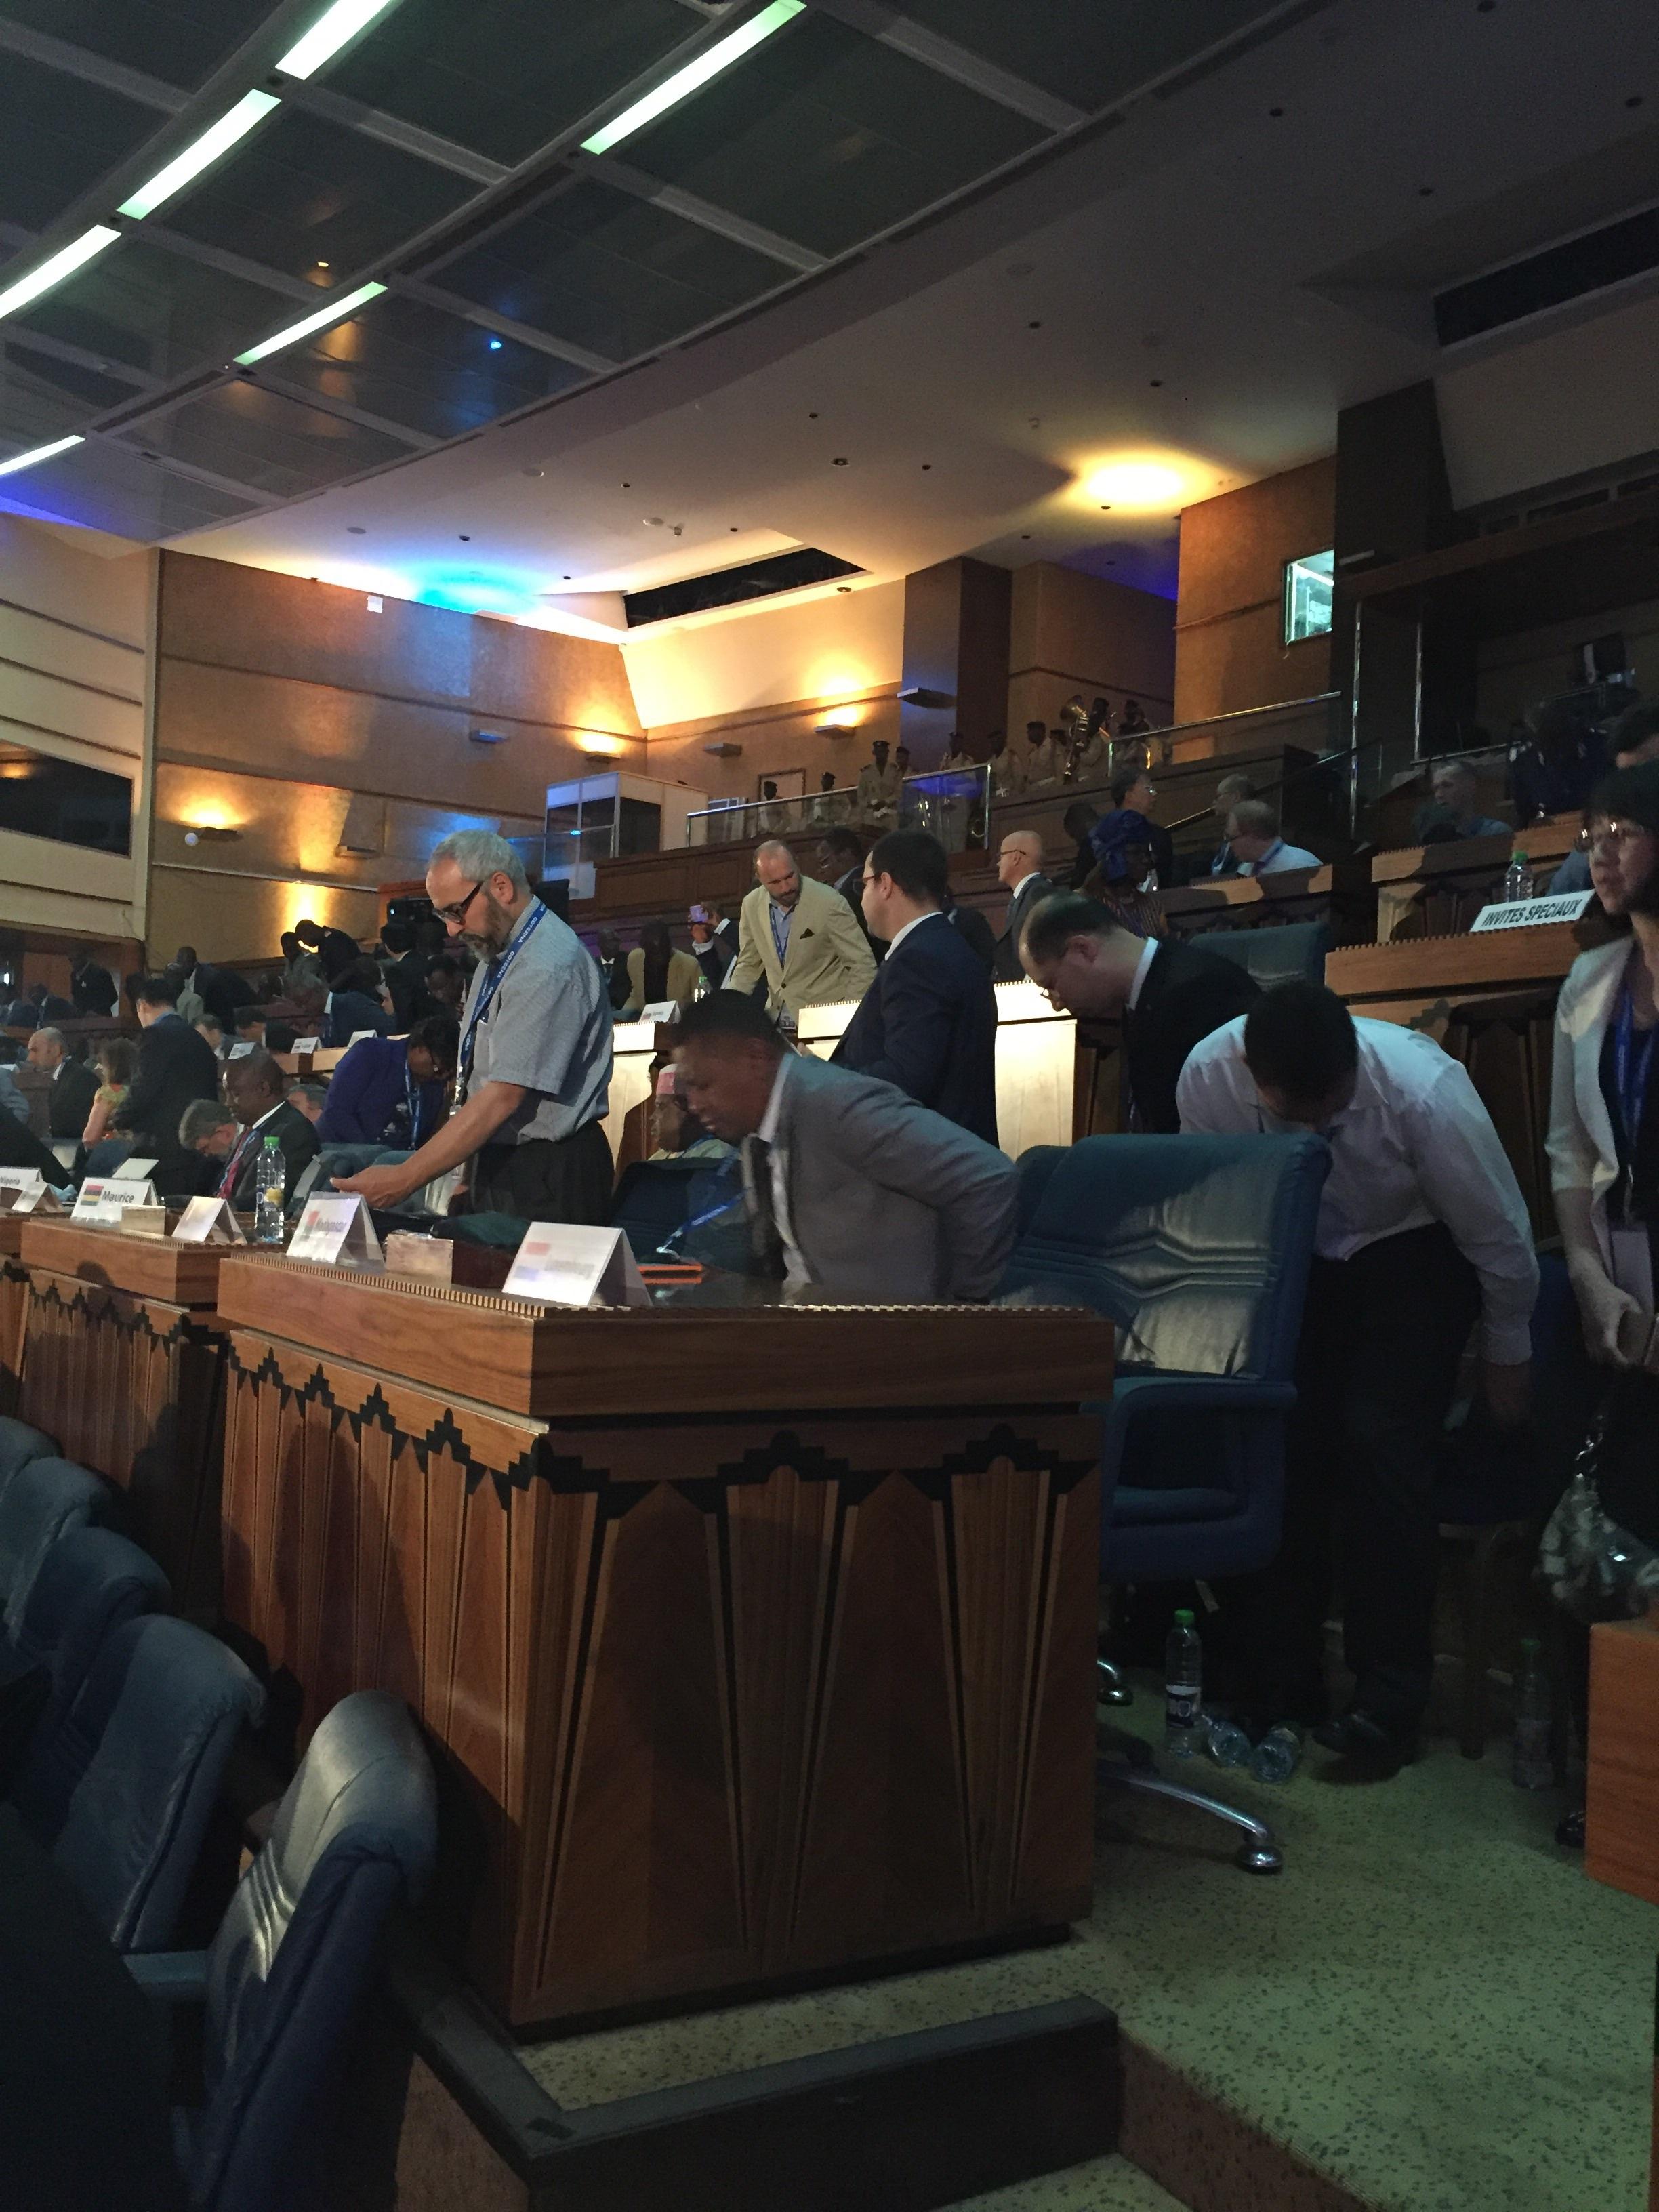 Plenary session getting underway...